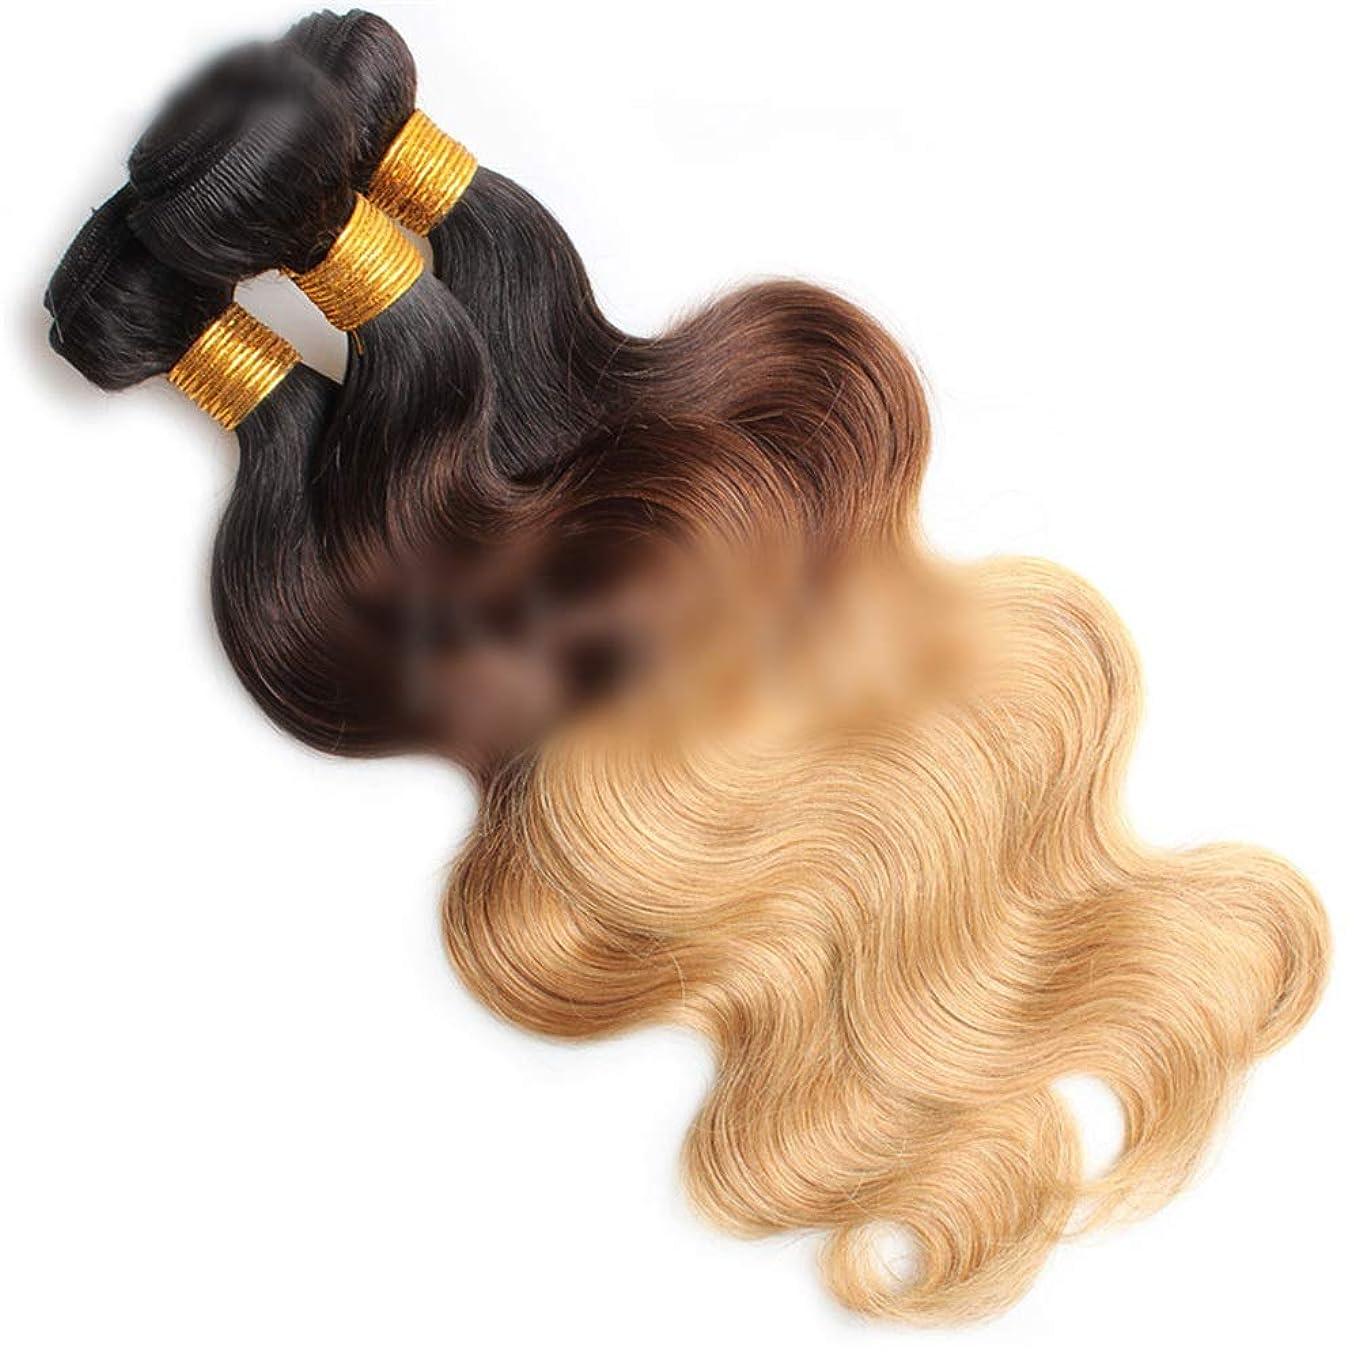 BOBIDYEE 実体波オンブルヘアバンドルナチュラルヘアエクステンション横糸 - 1B / 4/27#金髪3トーンカラー(100g / 1バンドル、10インチ-26インチ)合成髪レースかつらロールプレイングウィッグロング&ショート女性自然 (色 : Blonde, サイズ : 22 inch)